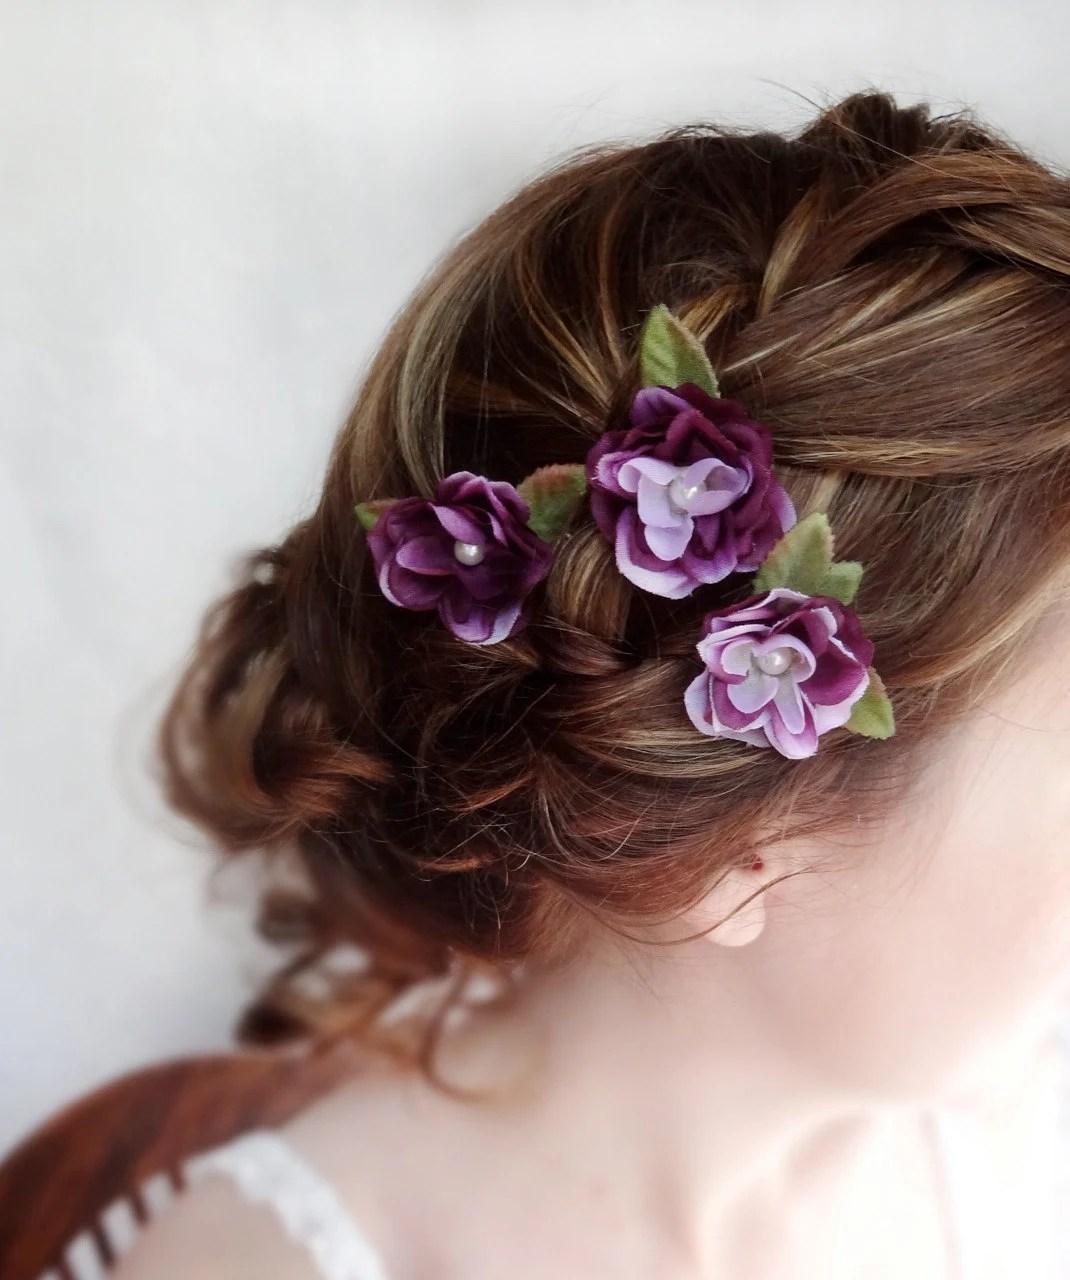 Items similar to eggplant flower hair accessory purple